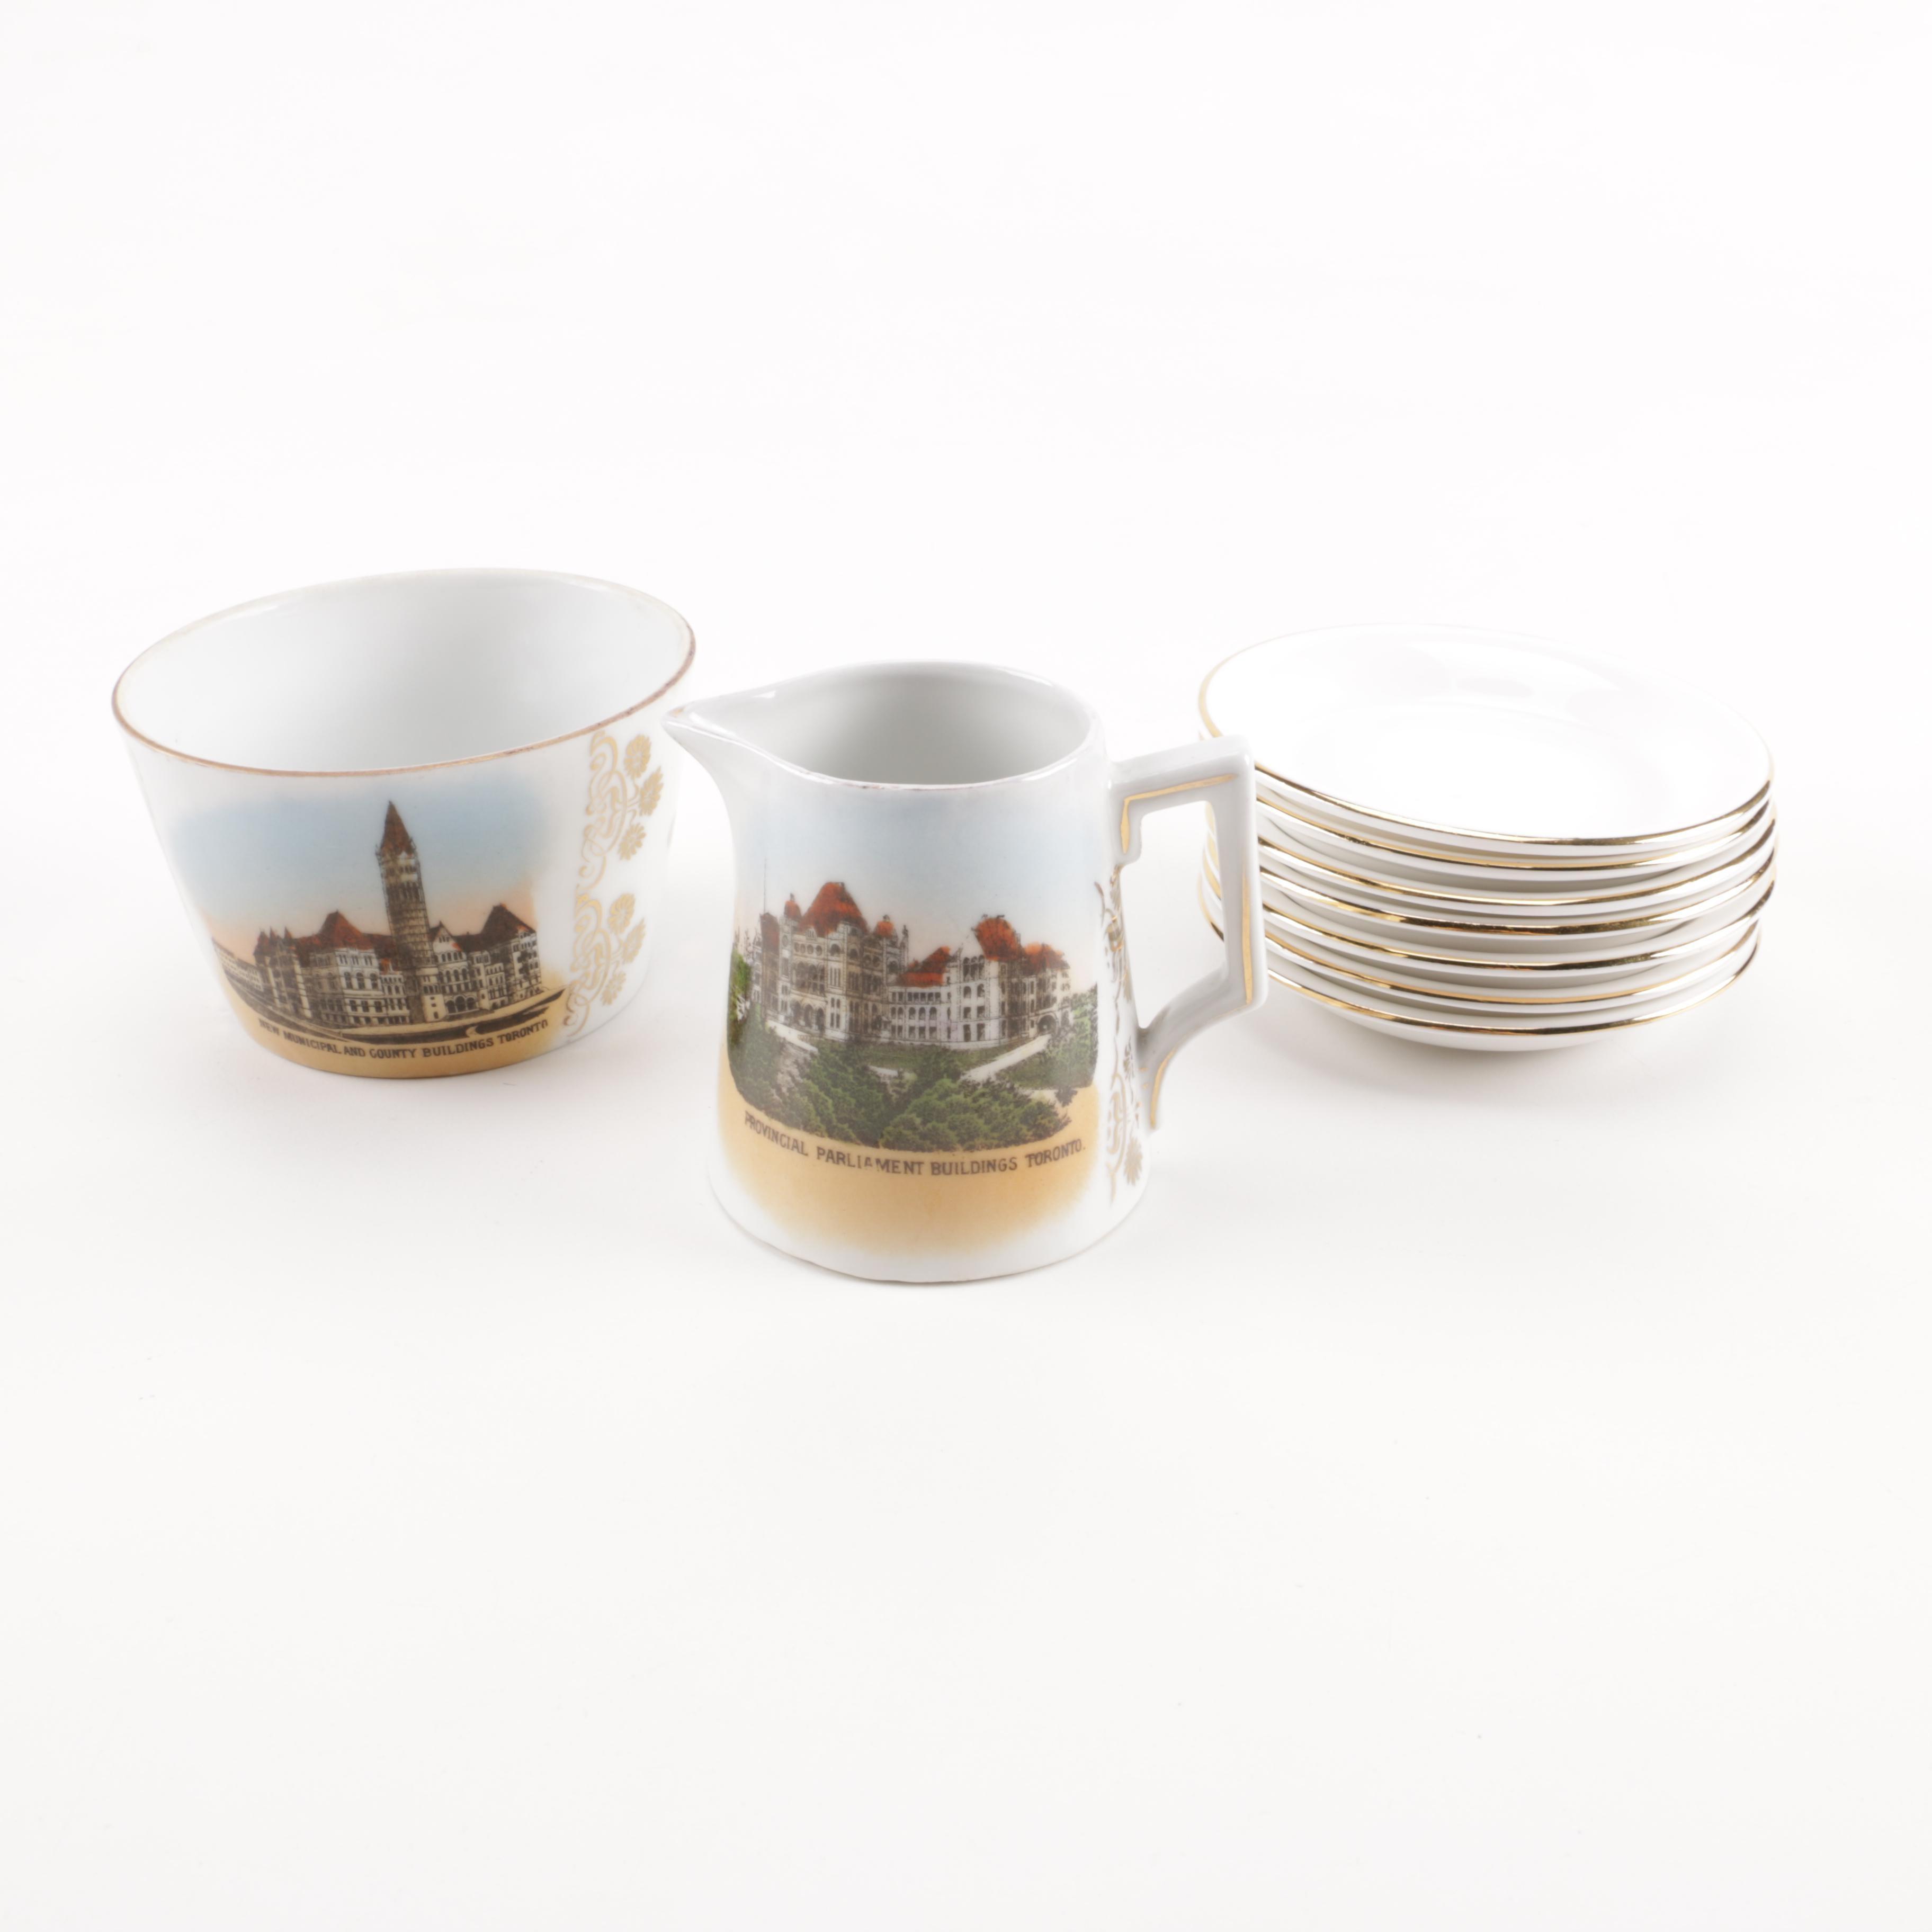 Royal Albert Bone China Saucers and Souvenir Ceramics